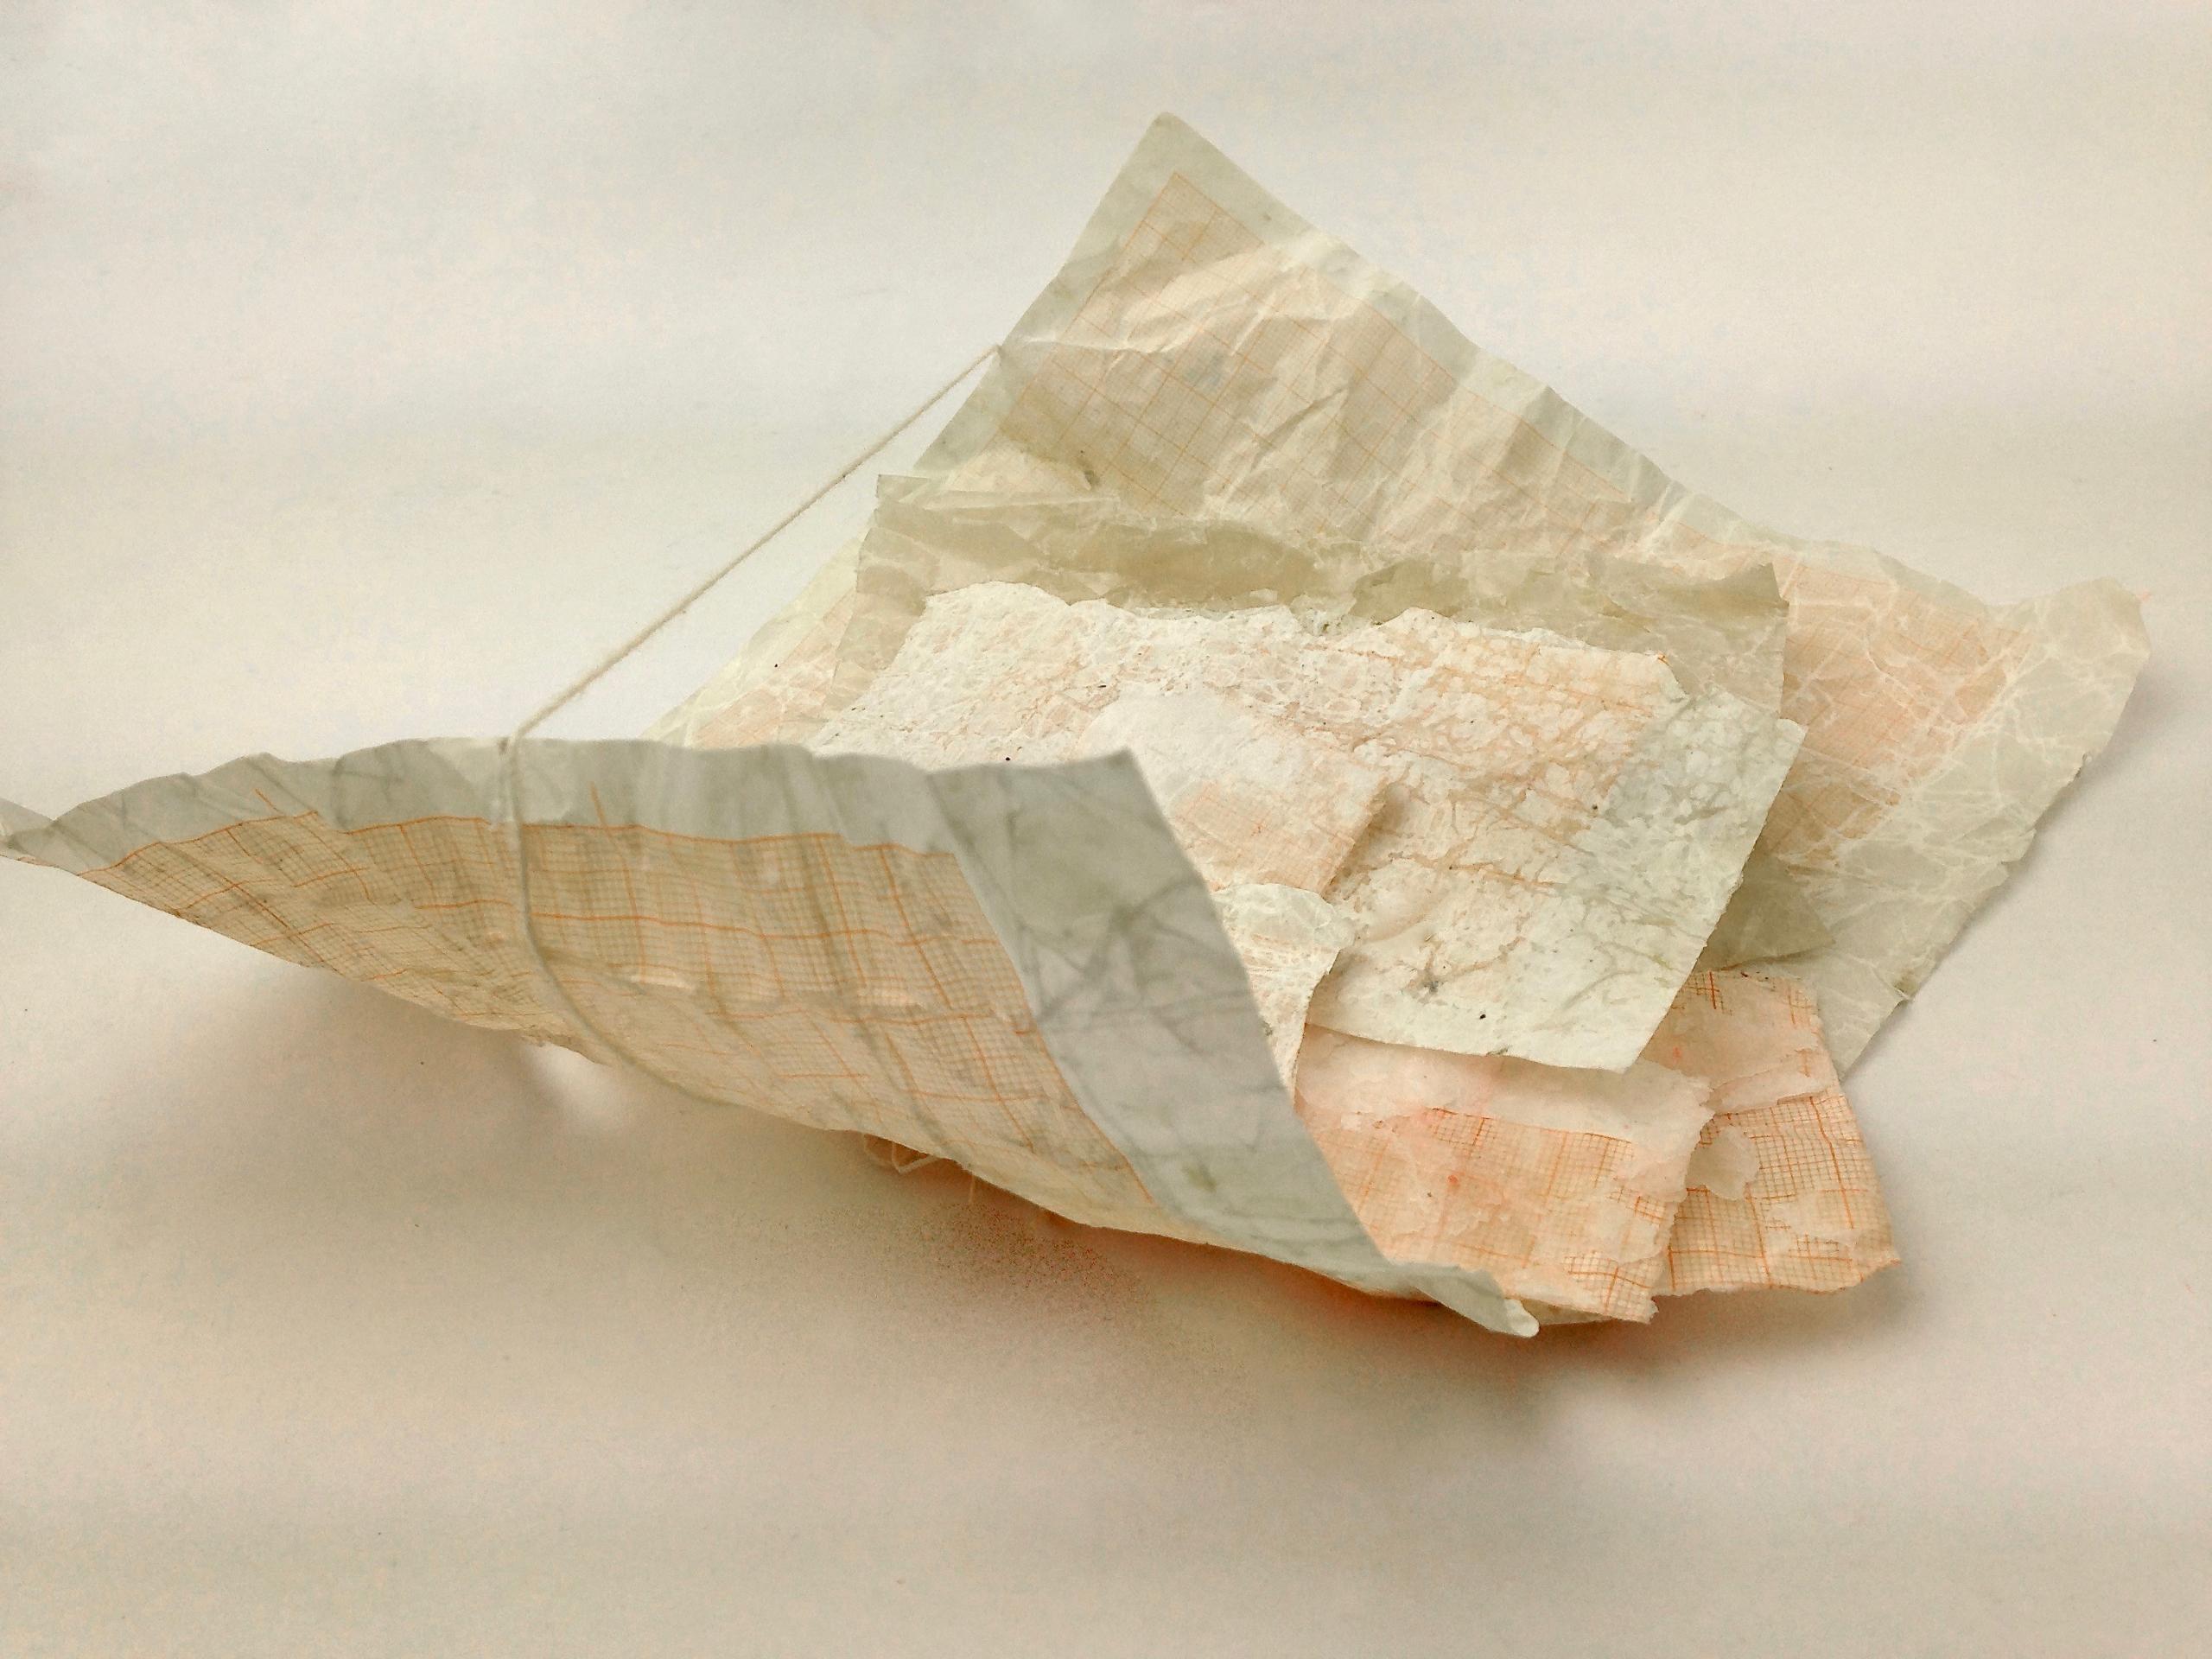 Papierversuch 1. Sybille Fenzel